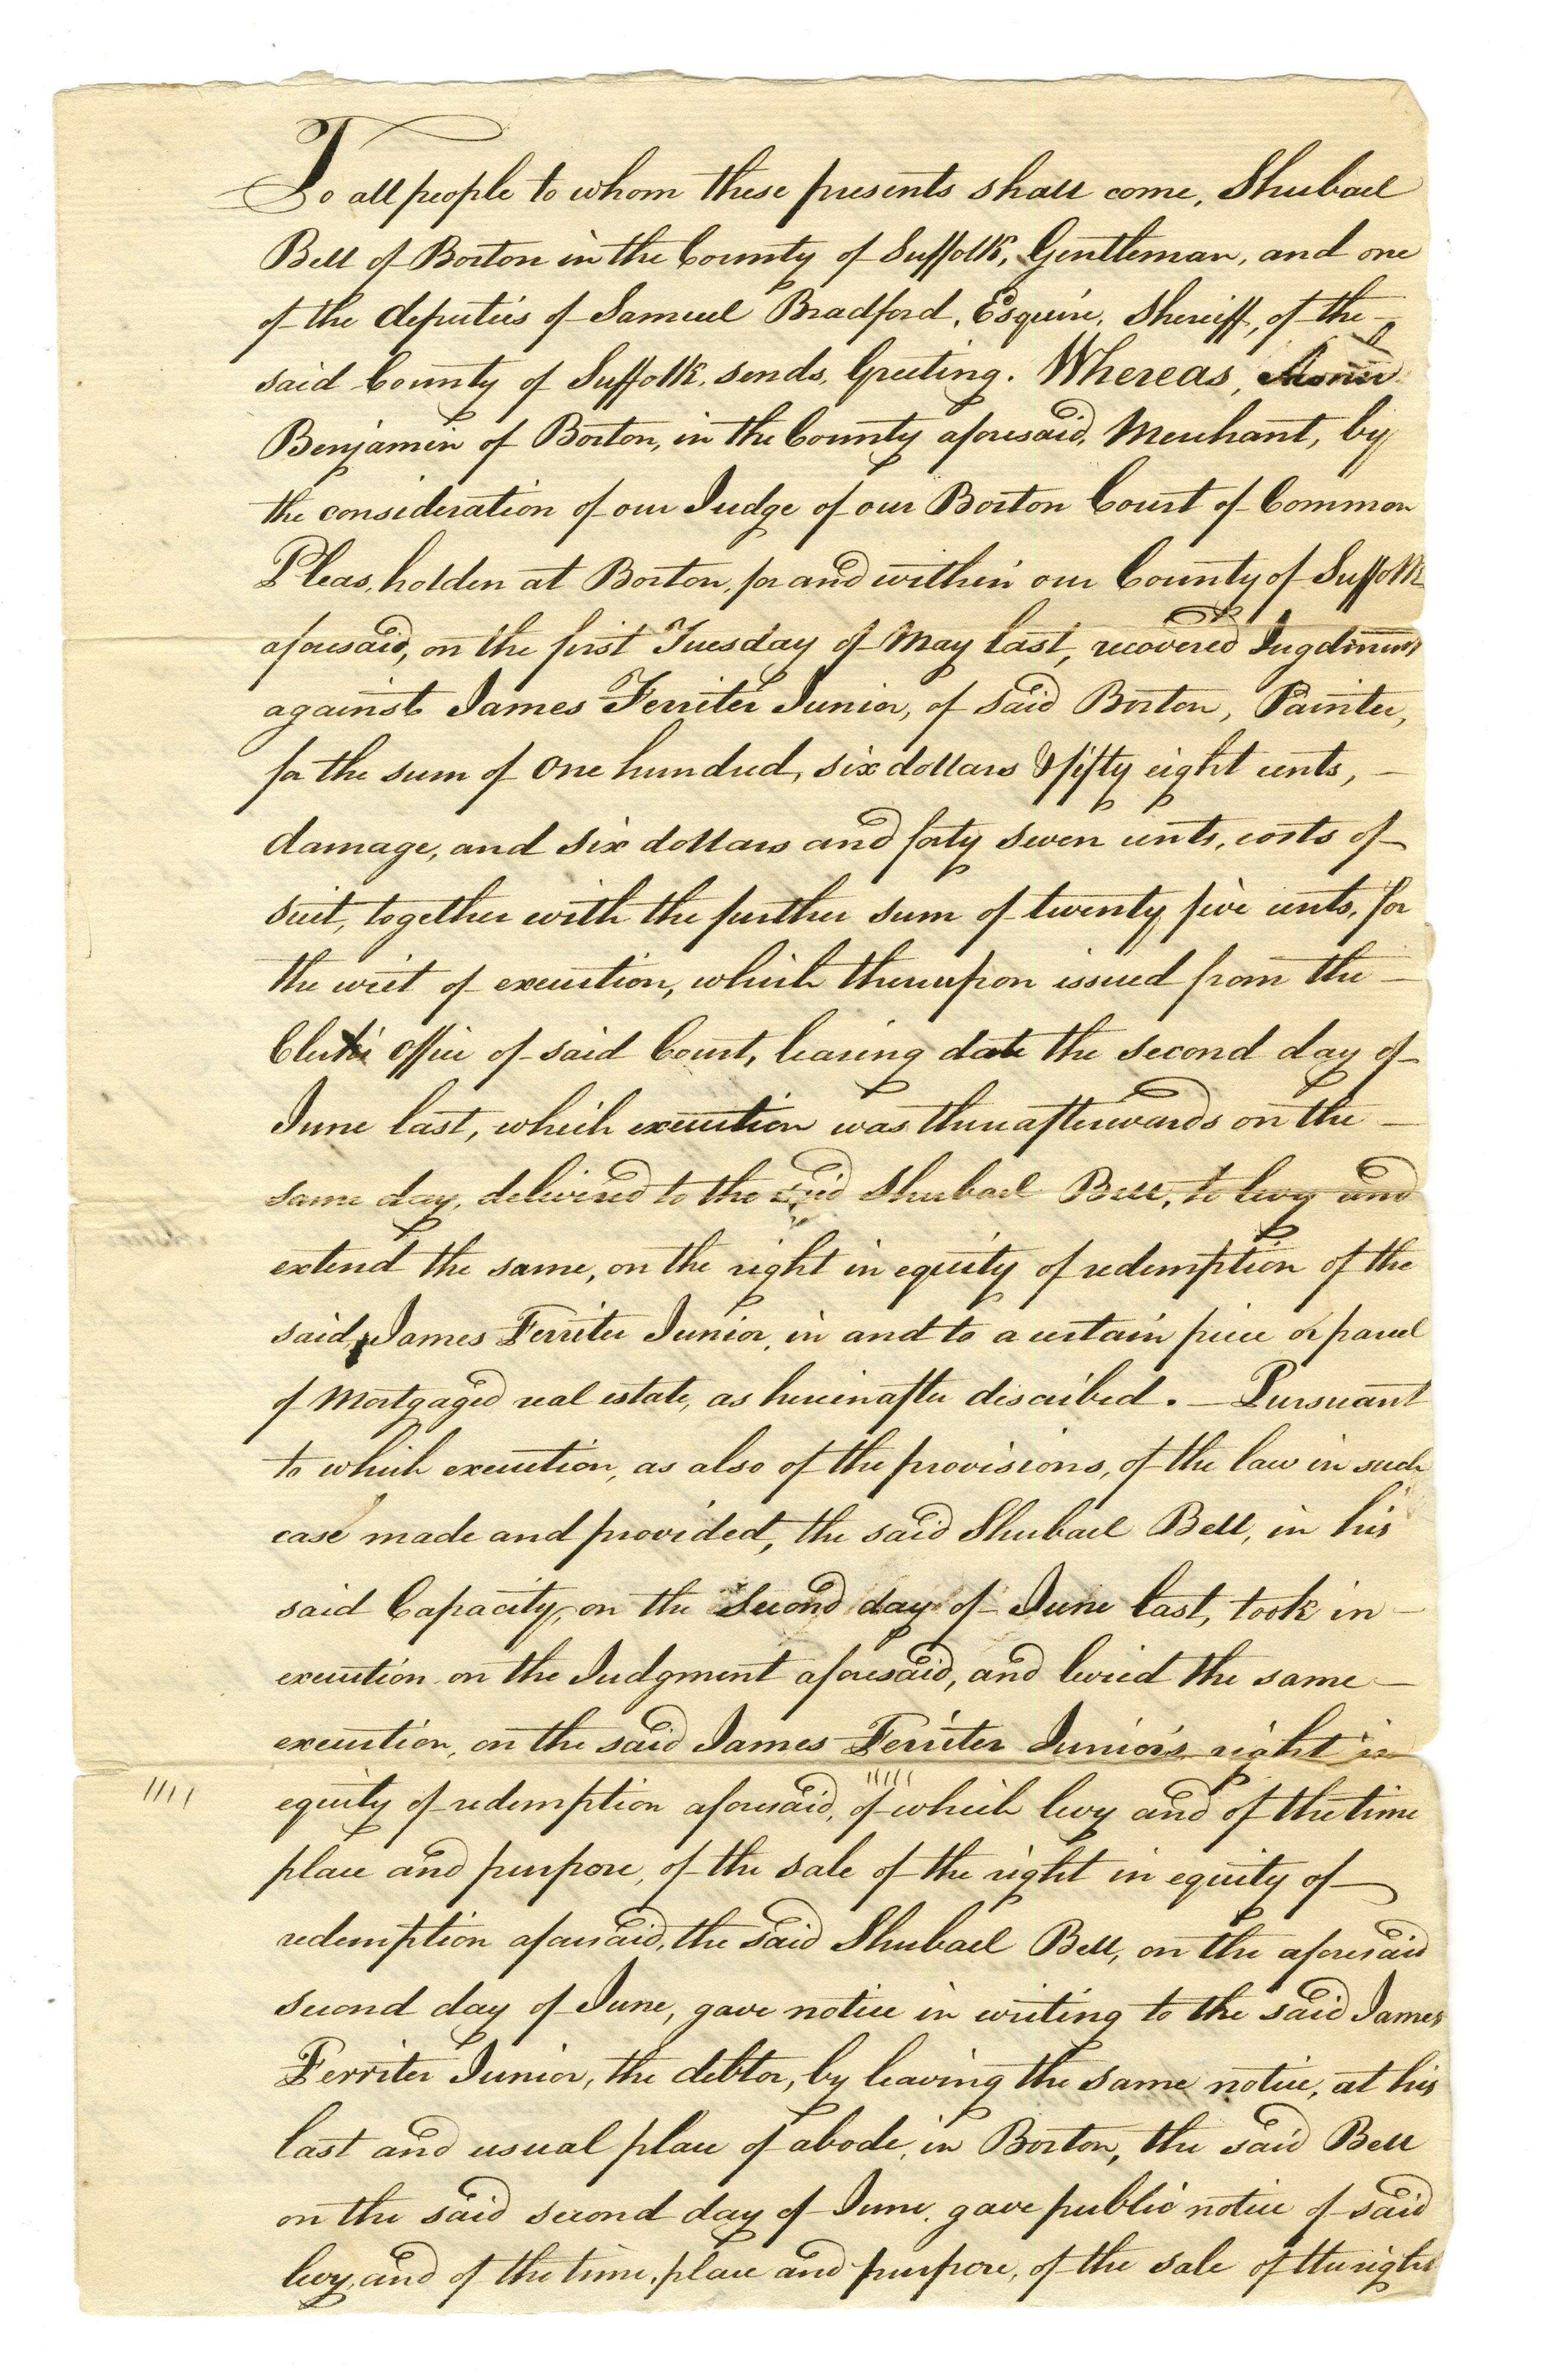 Early Boston Legal Document Involving Architect Asher Benjamin